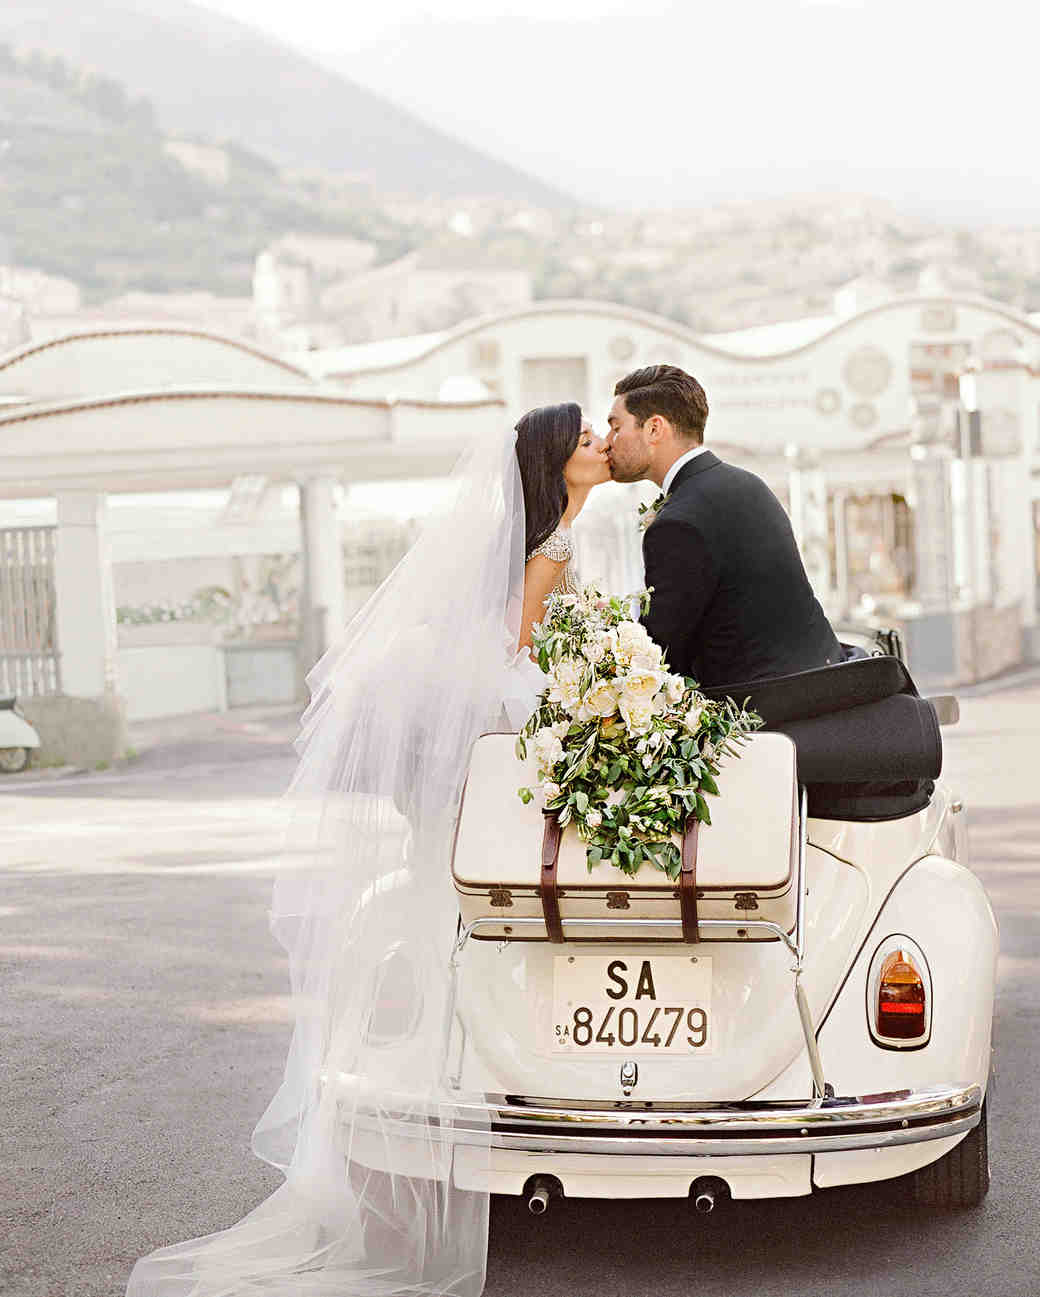 couple-wedding-kissing-car-italy-103351309_vert.jpg